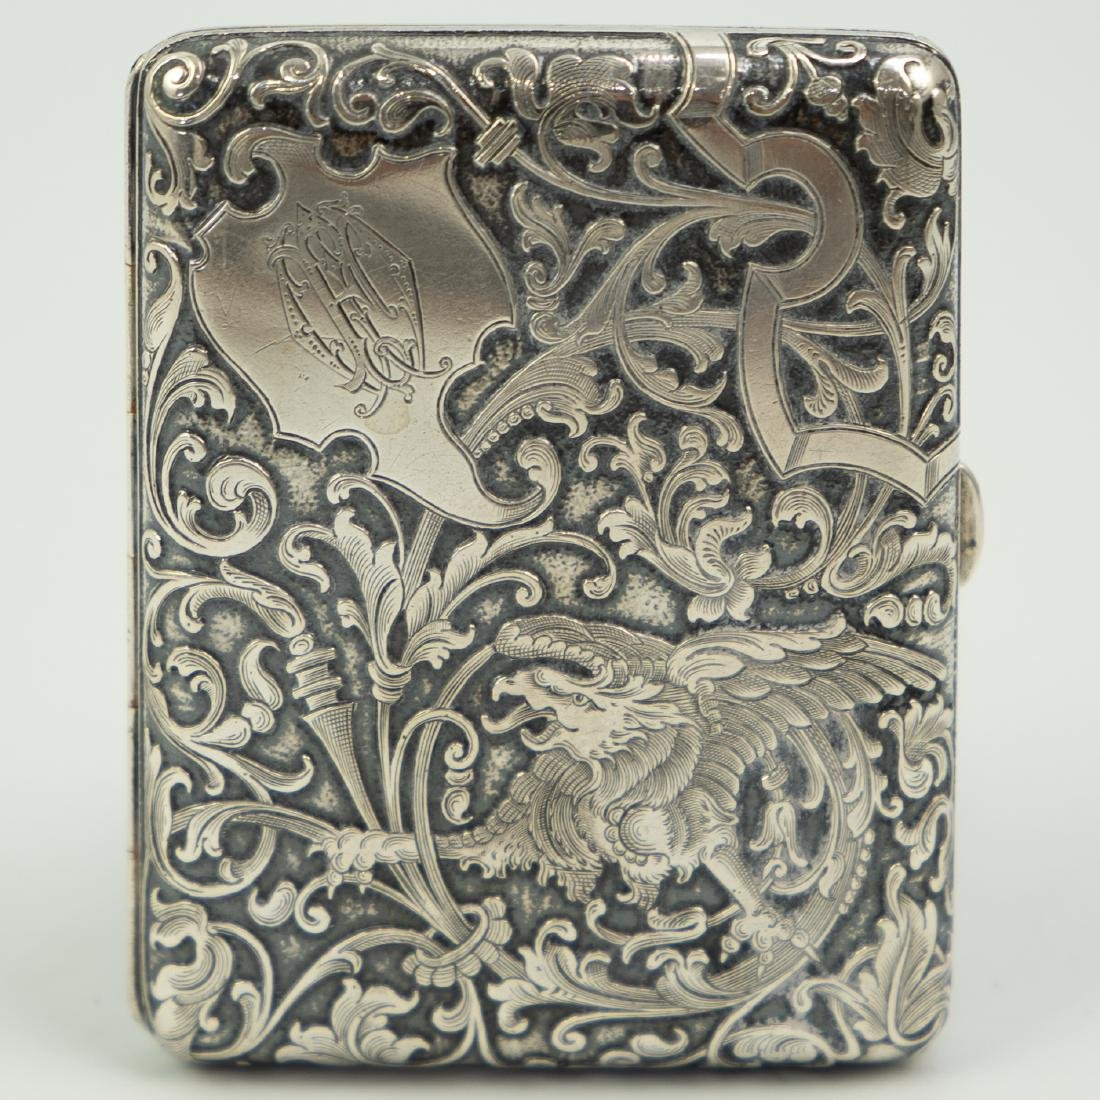 Austrian 900 Silver Card Case